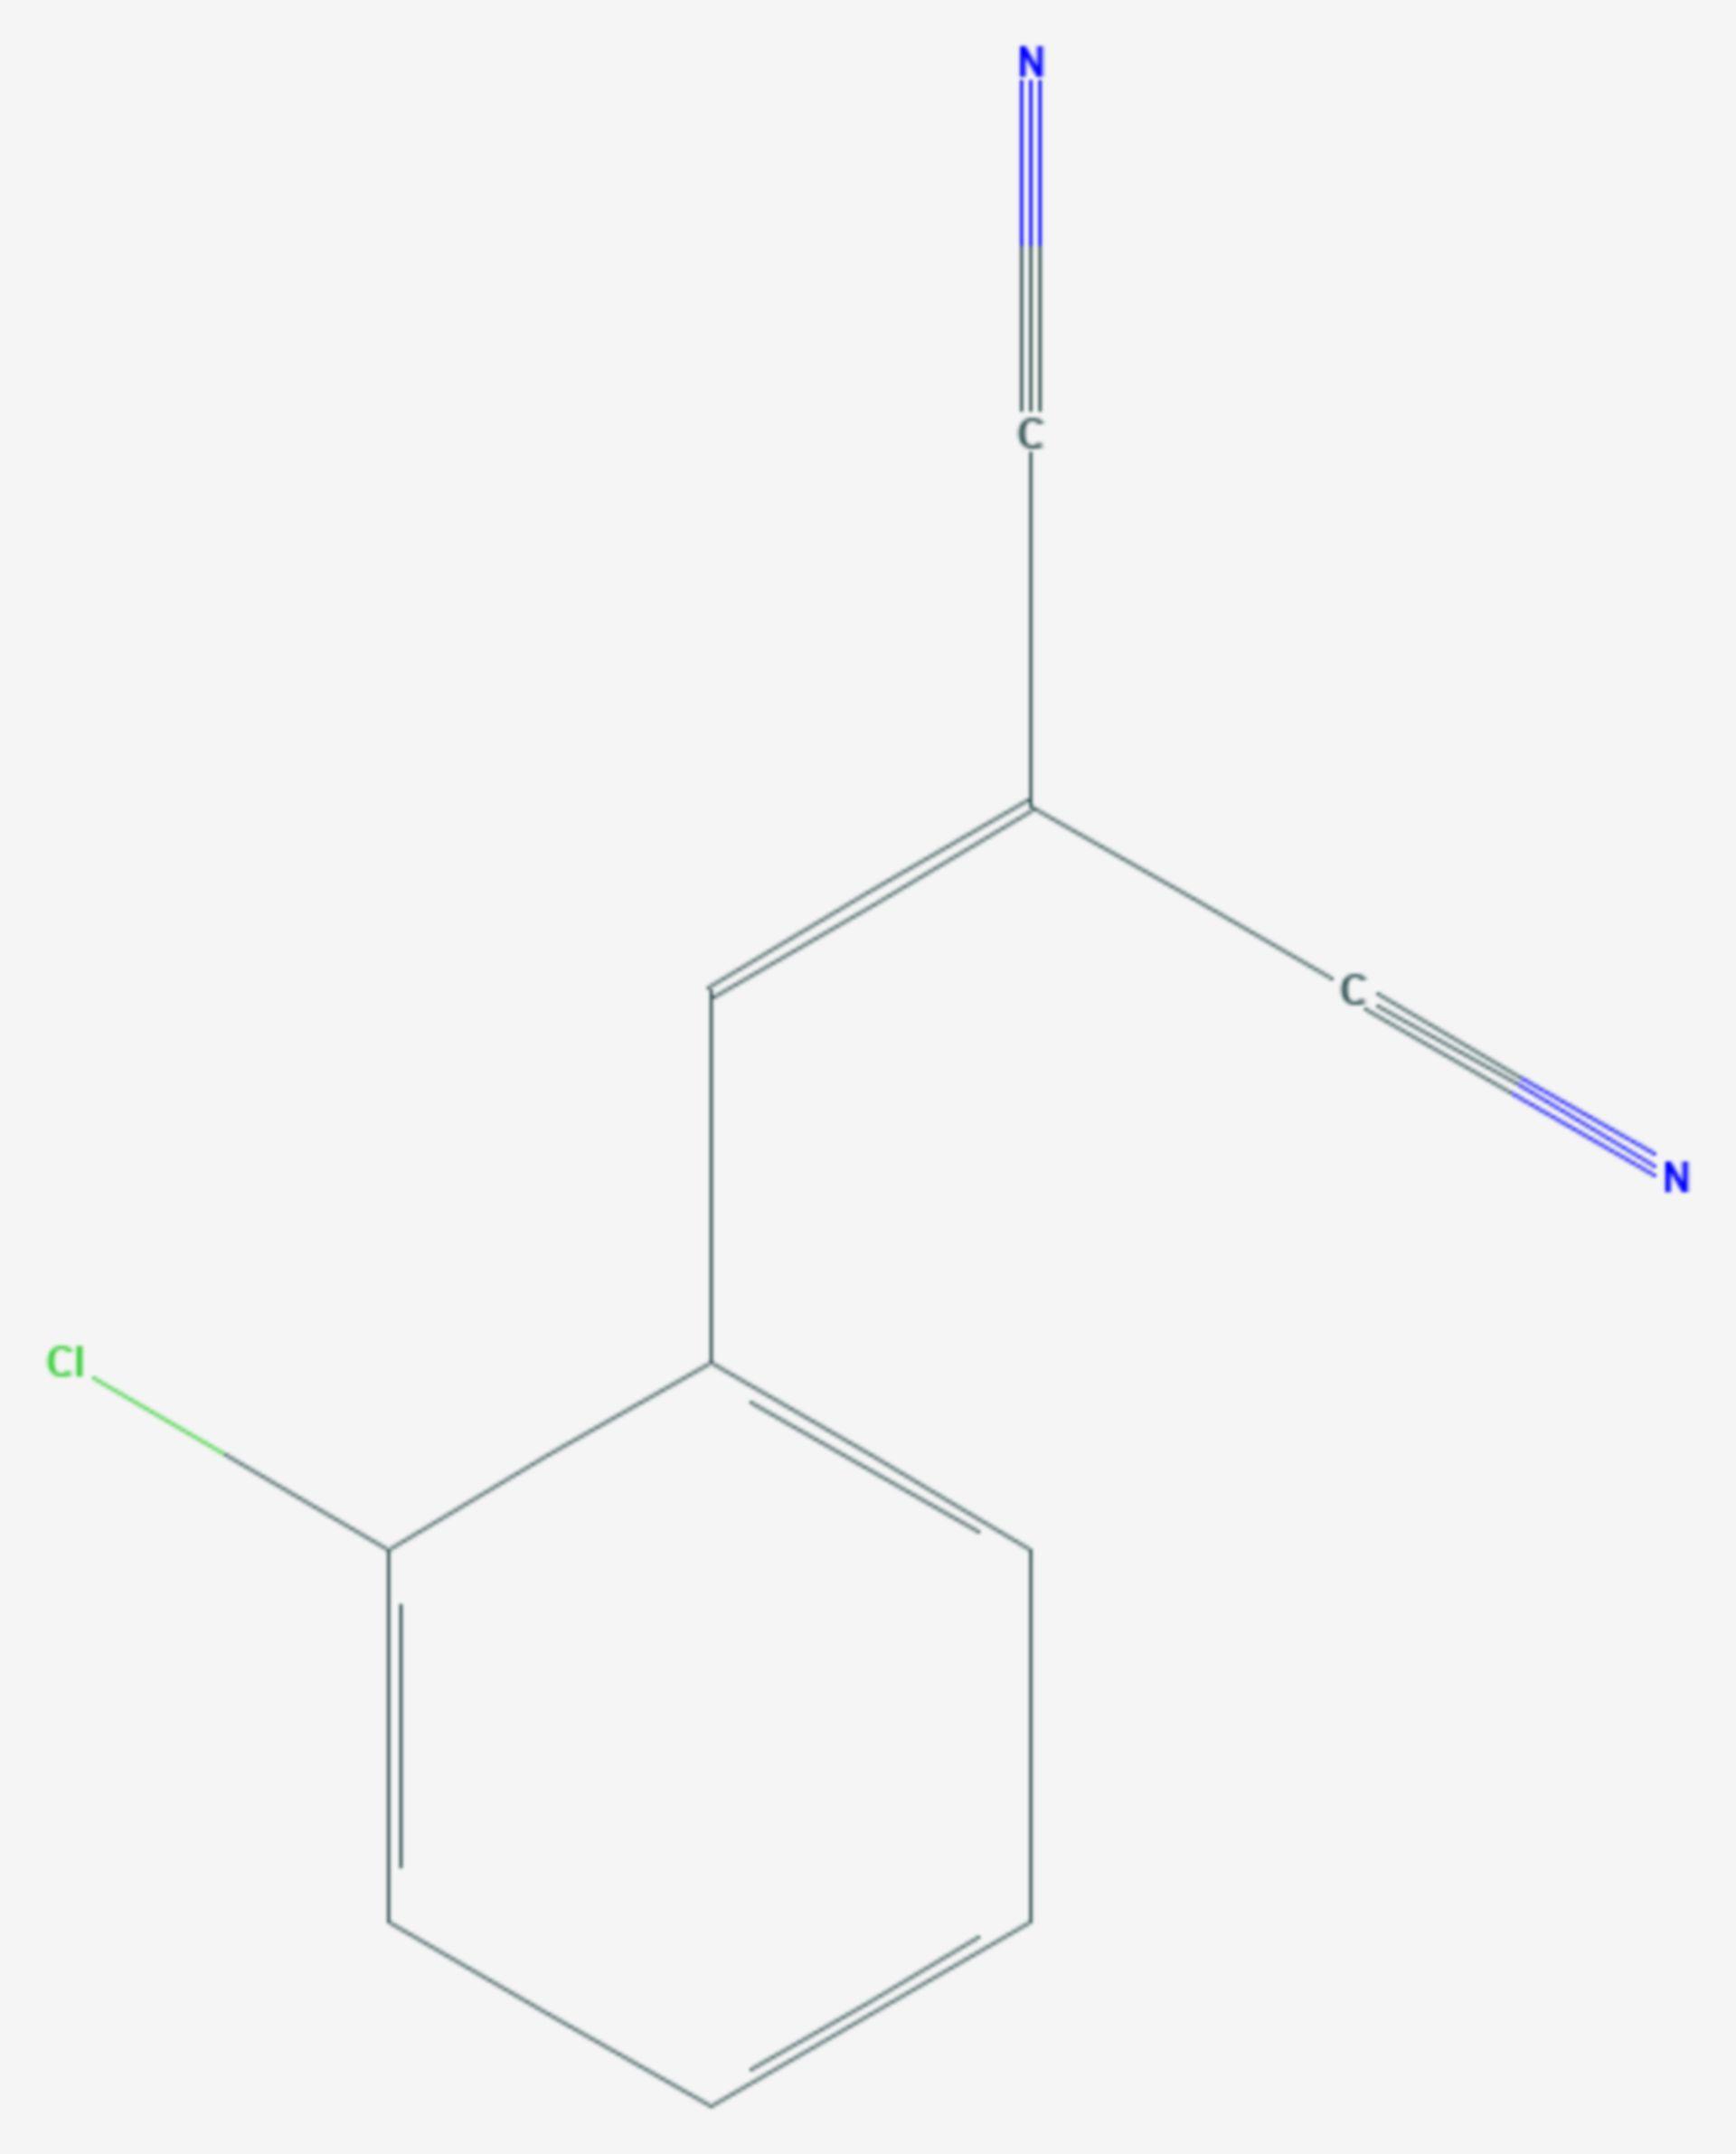 2-Chlorbenzylidenmalonsäuredinitril (Strukturformel)